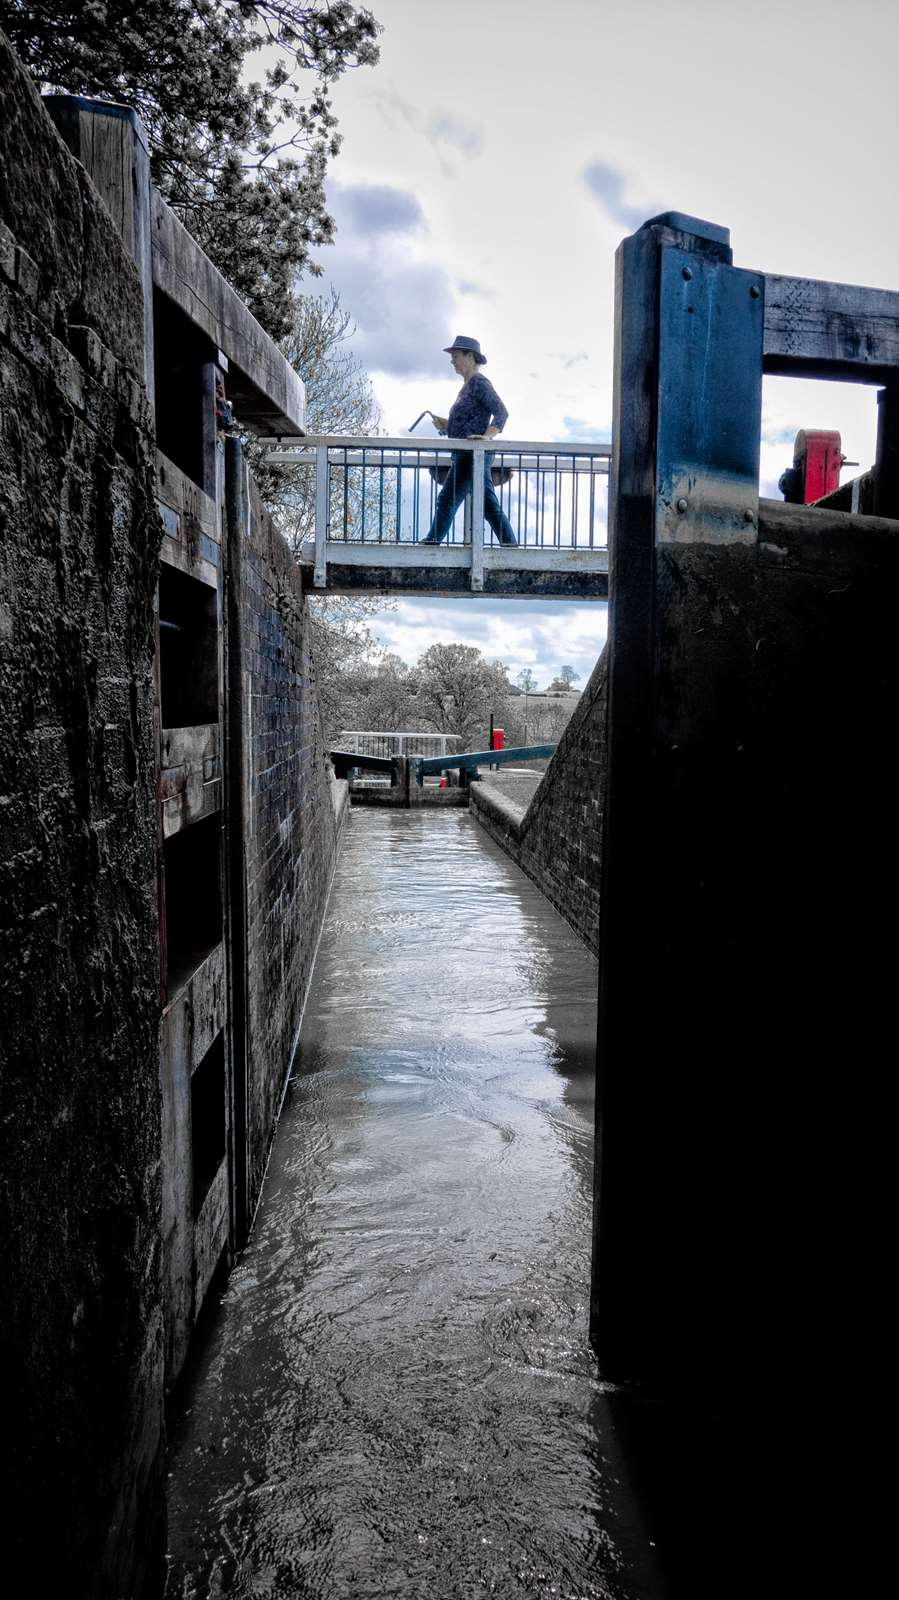 Sandra crossing the bridge over the Watford Staircase Lock.